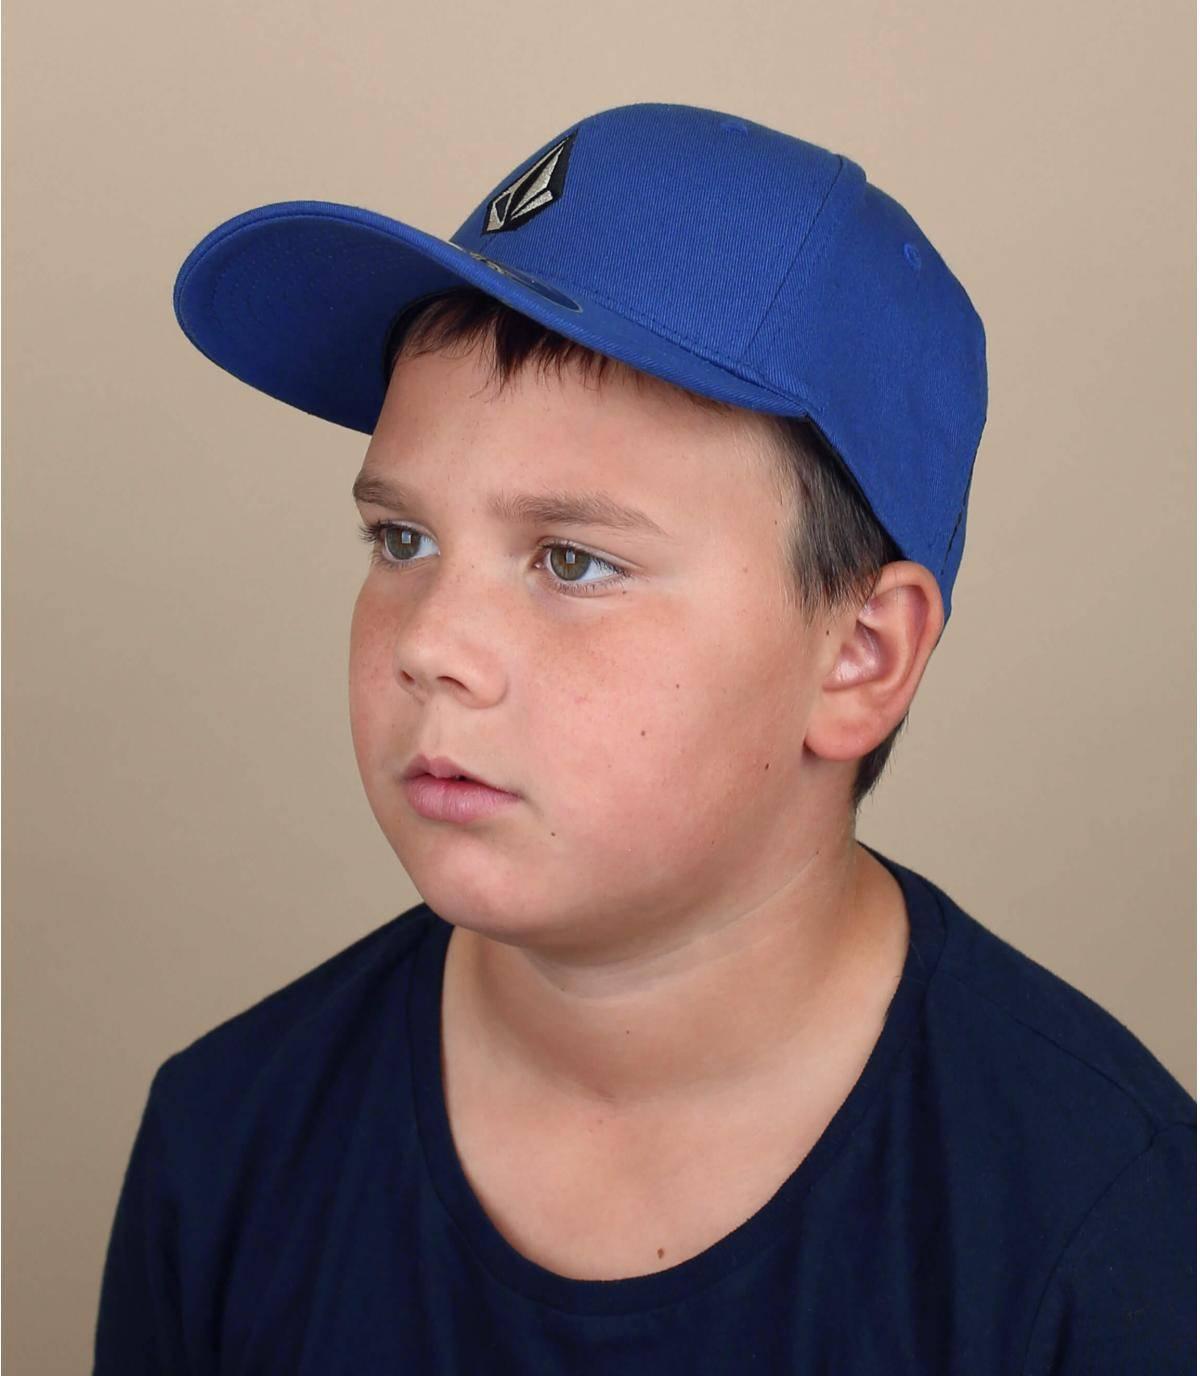 Gorra niño Volcom azul